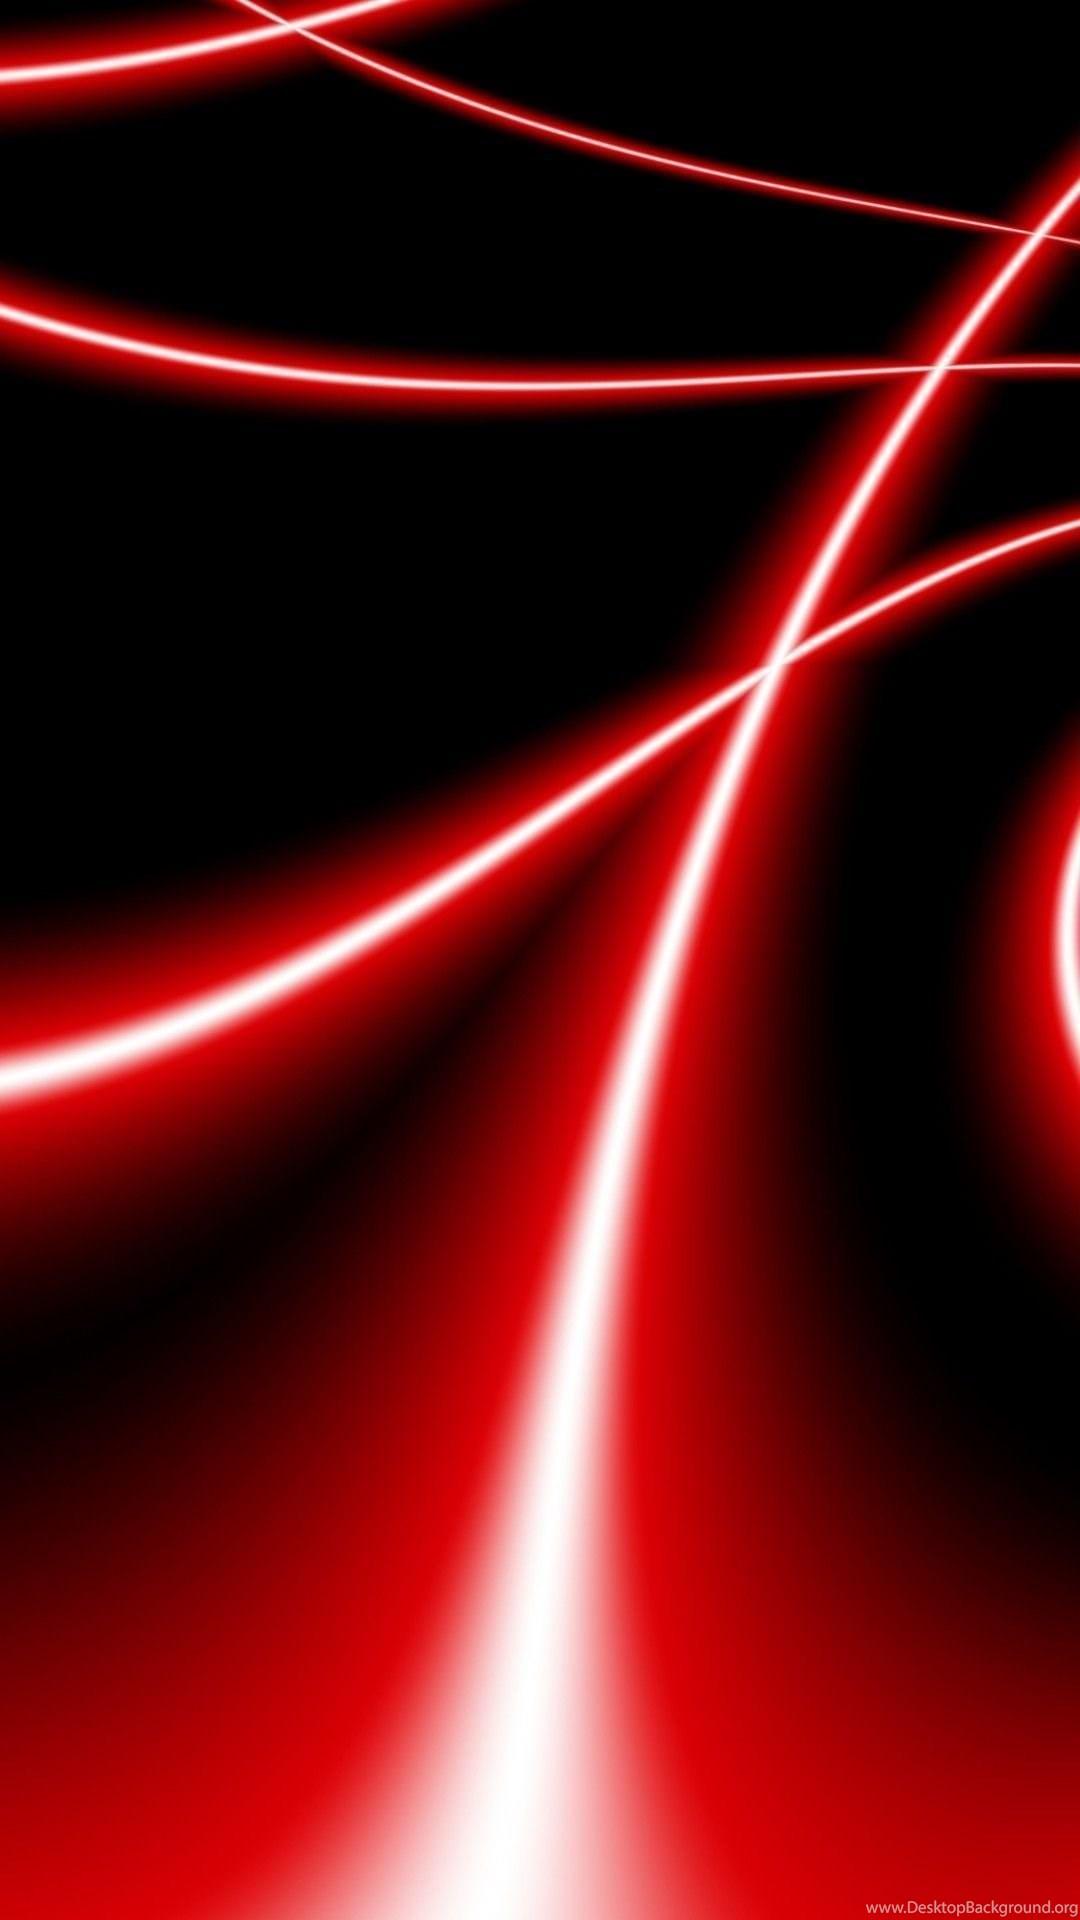 Unduh 99 Background Black Red Line Gratis Terbaru